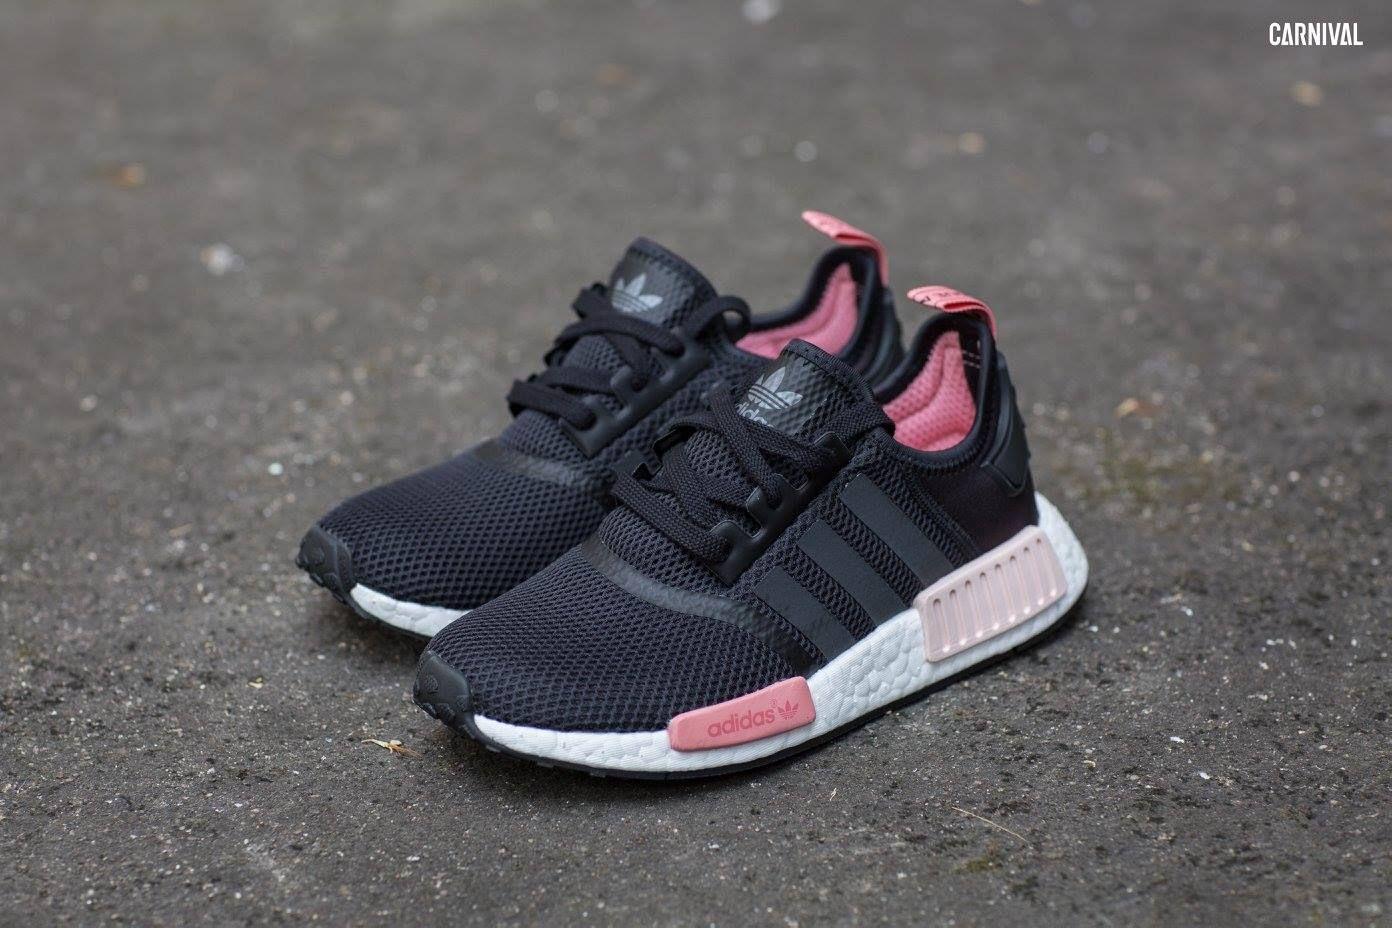 adidas nmd c1 Pink